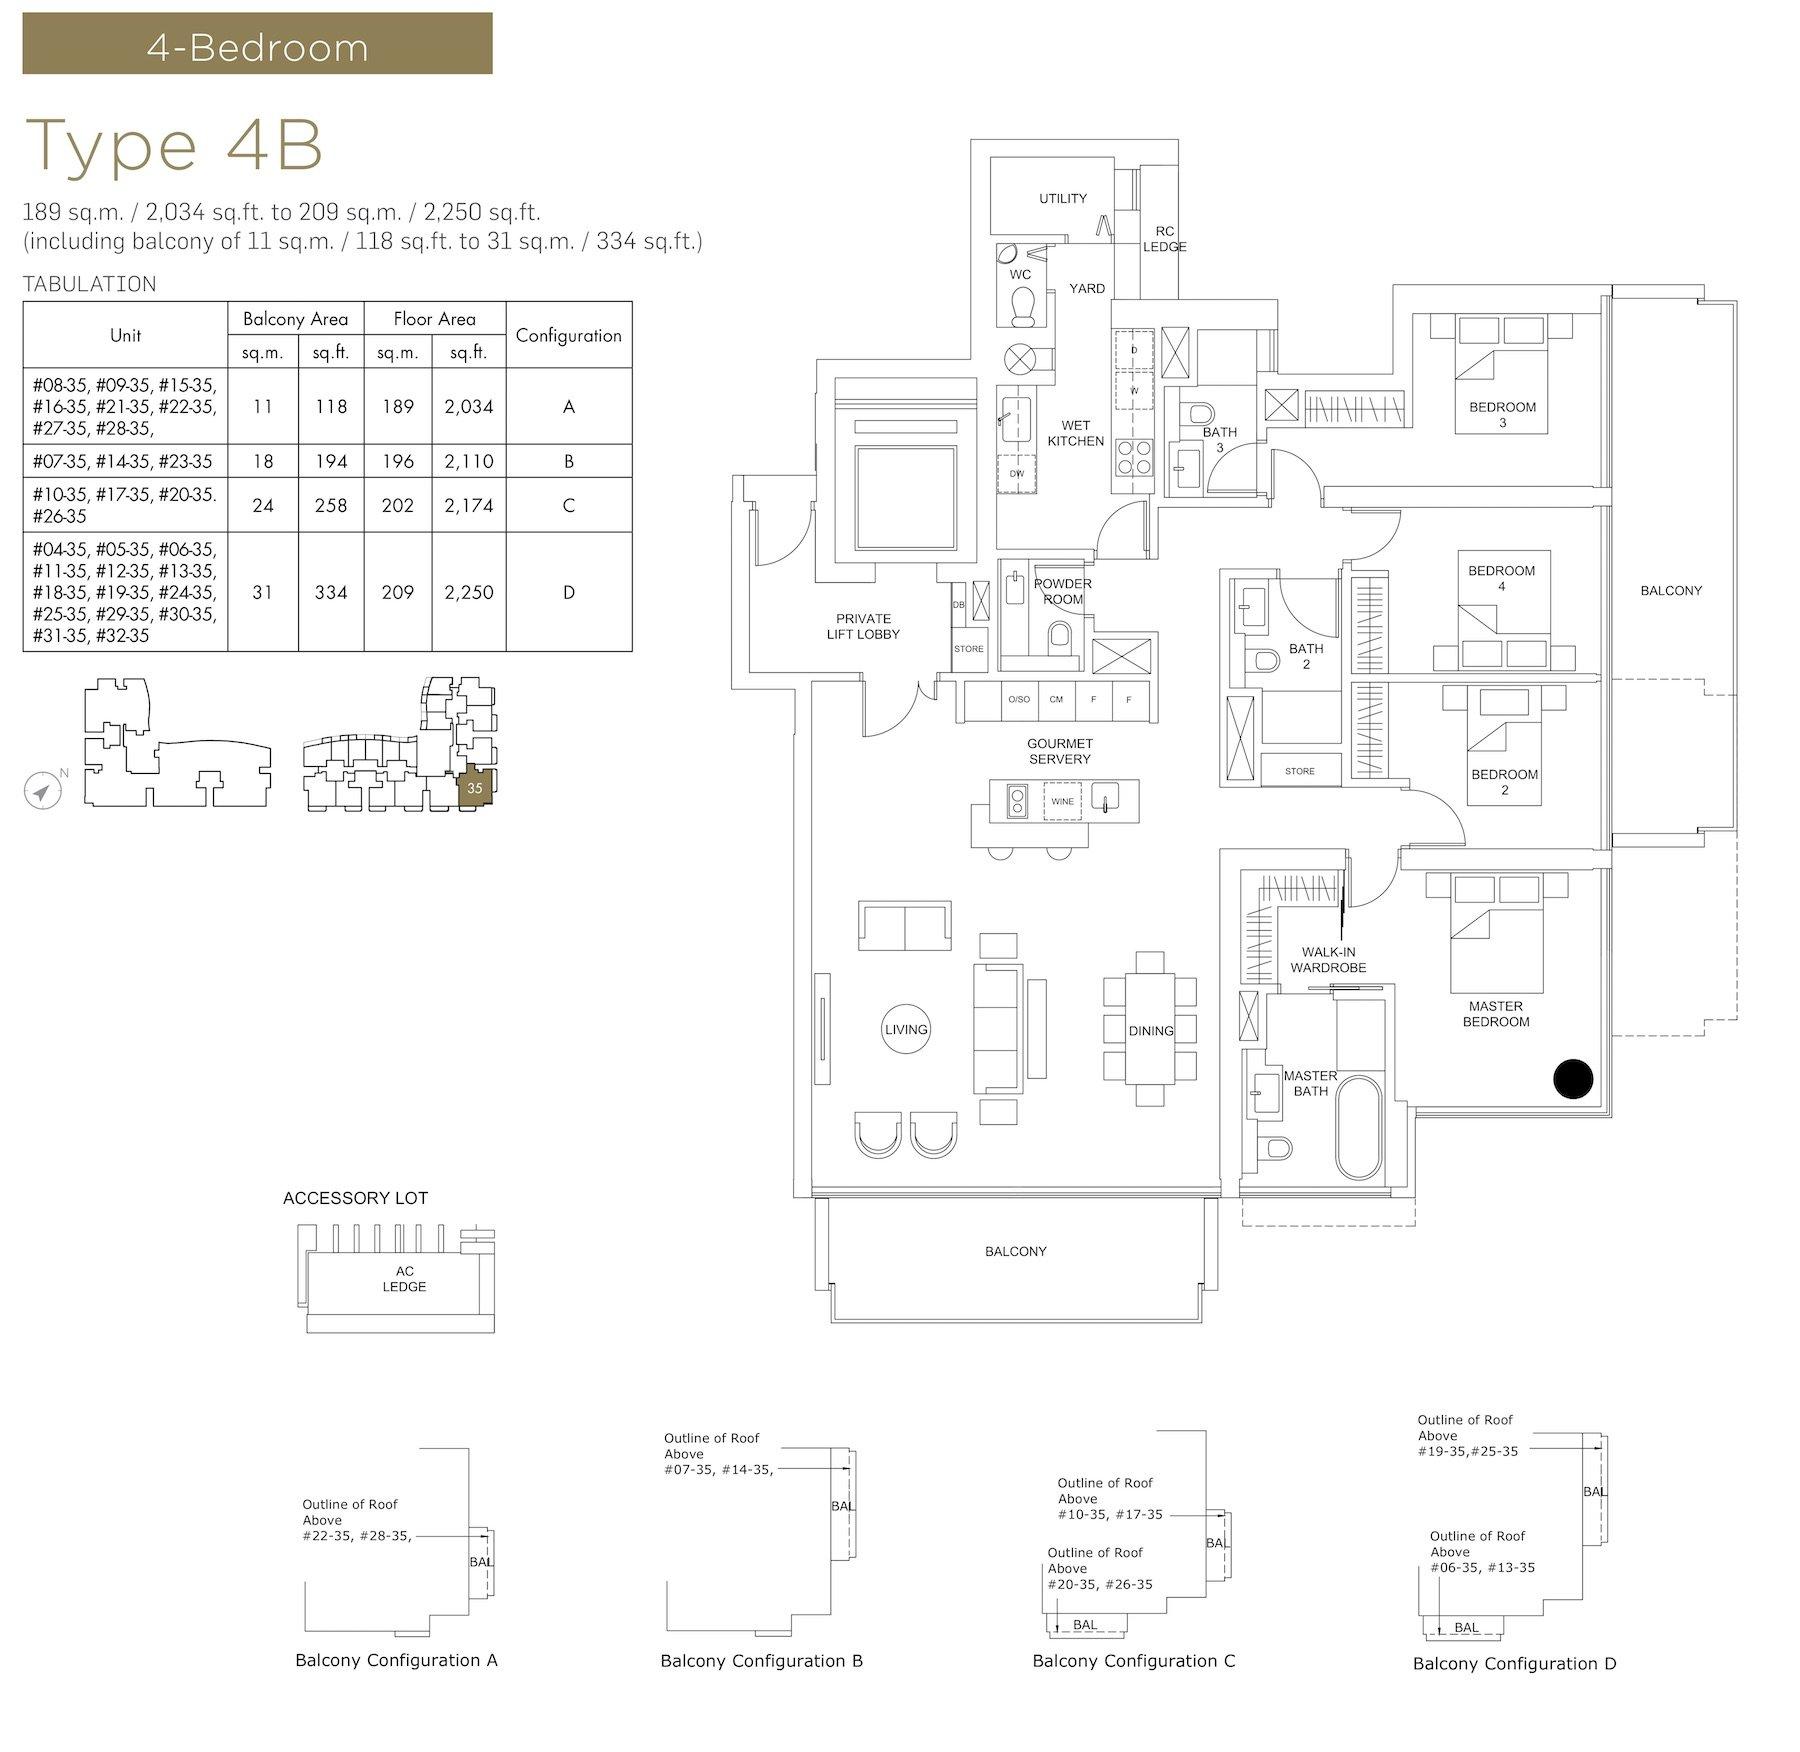 Marina One Residences 滨海盛景豪苑 floor plans 4 bedroom 4B